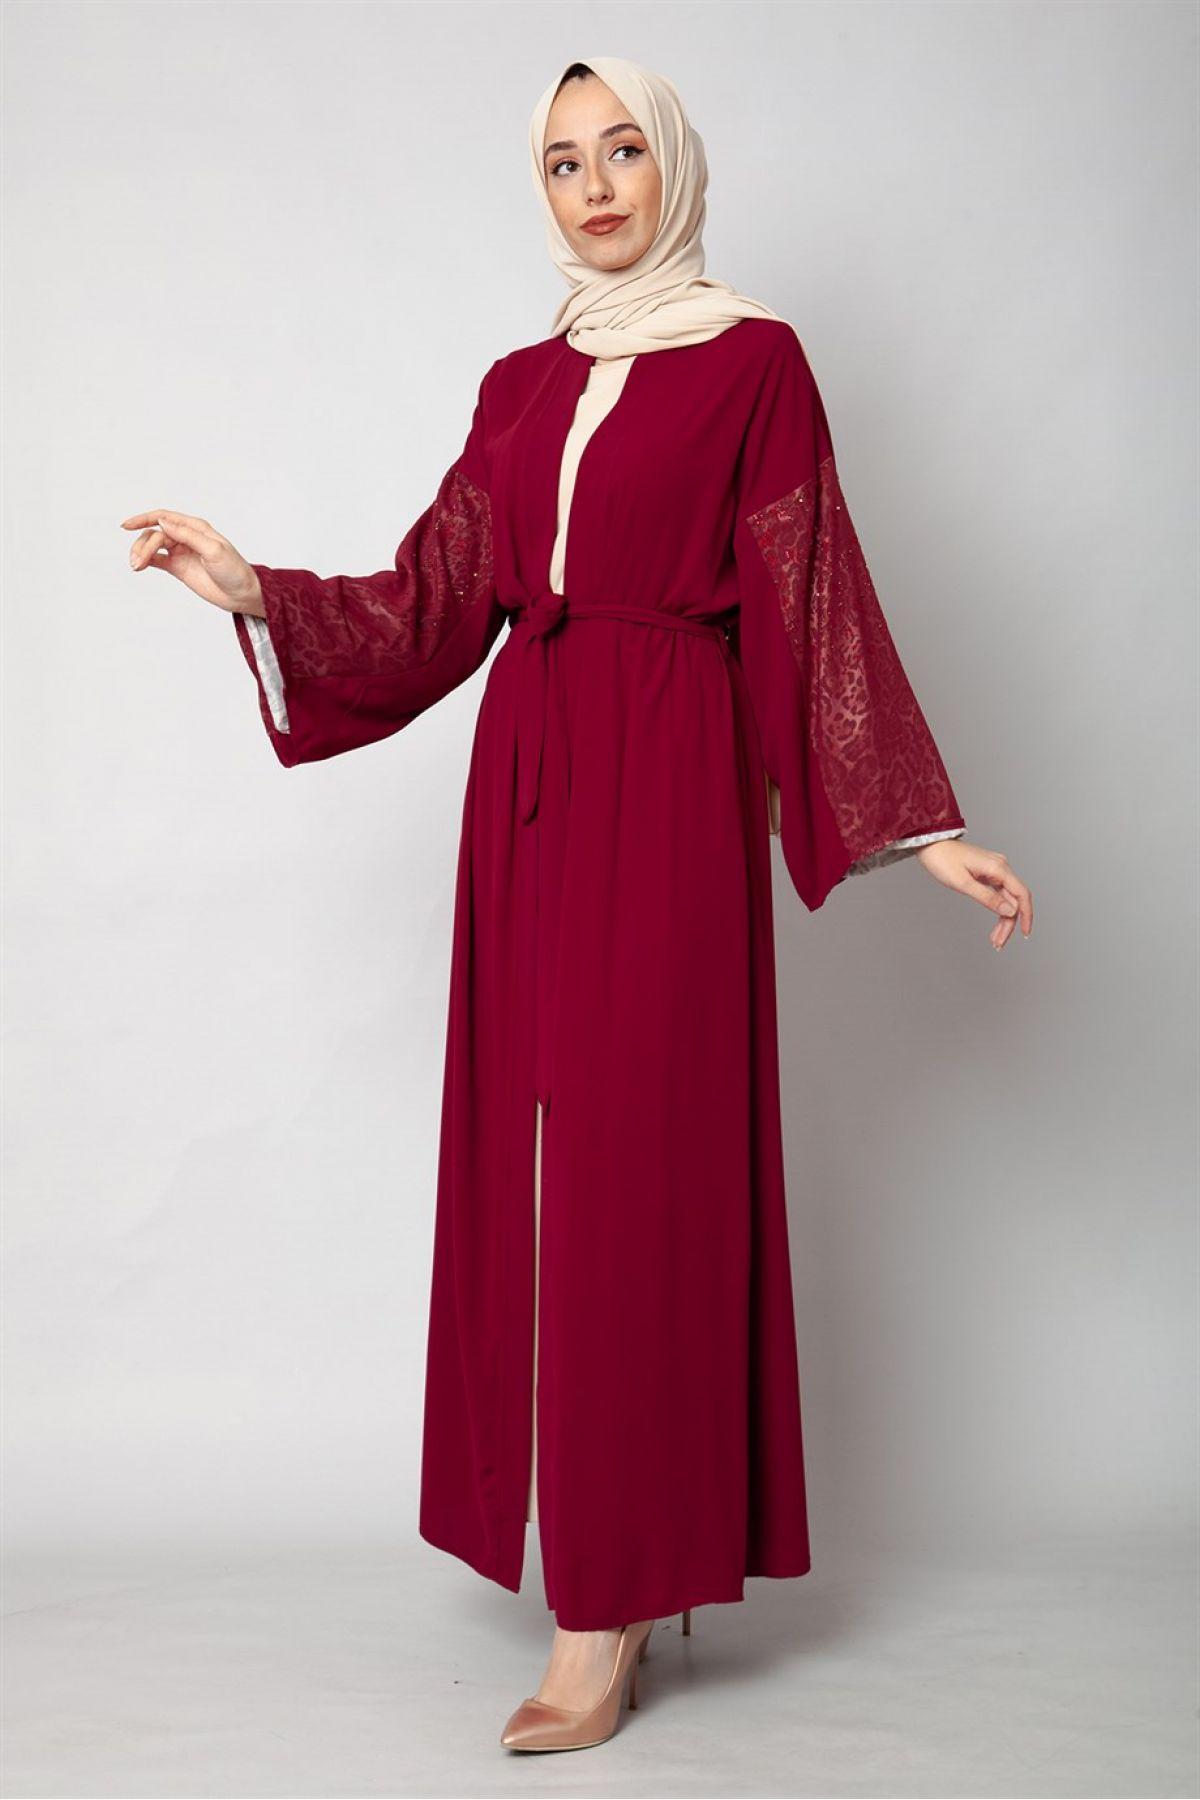 Evening Dress-Claret Red